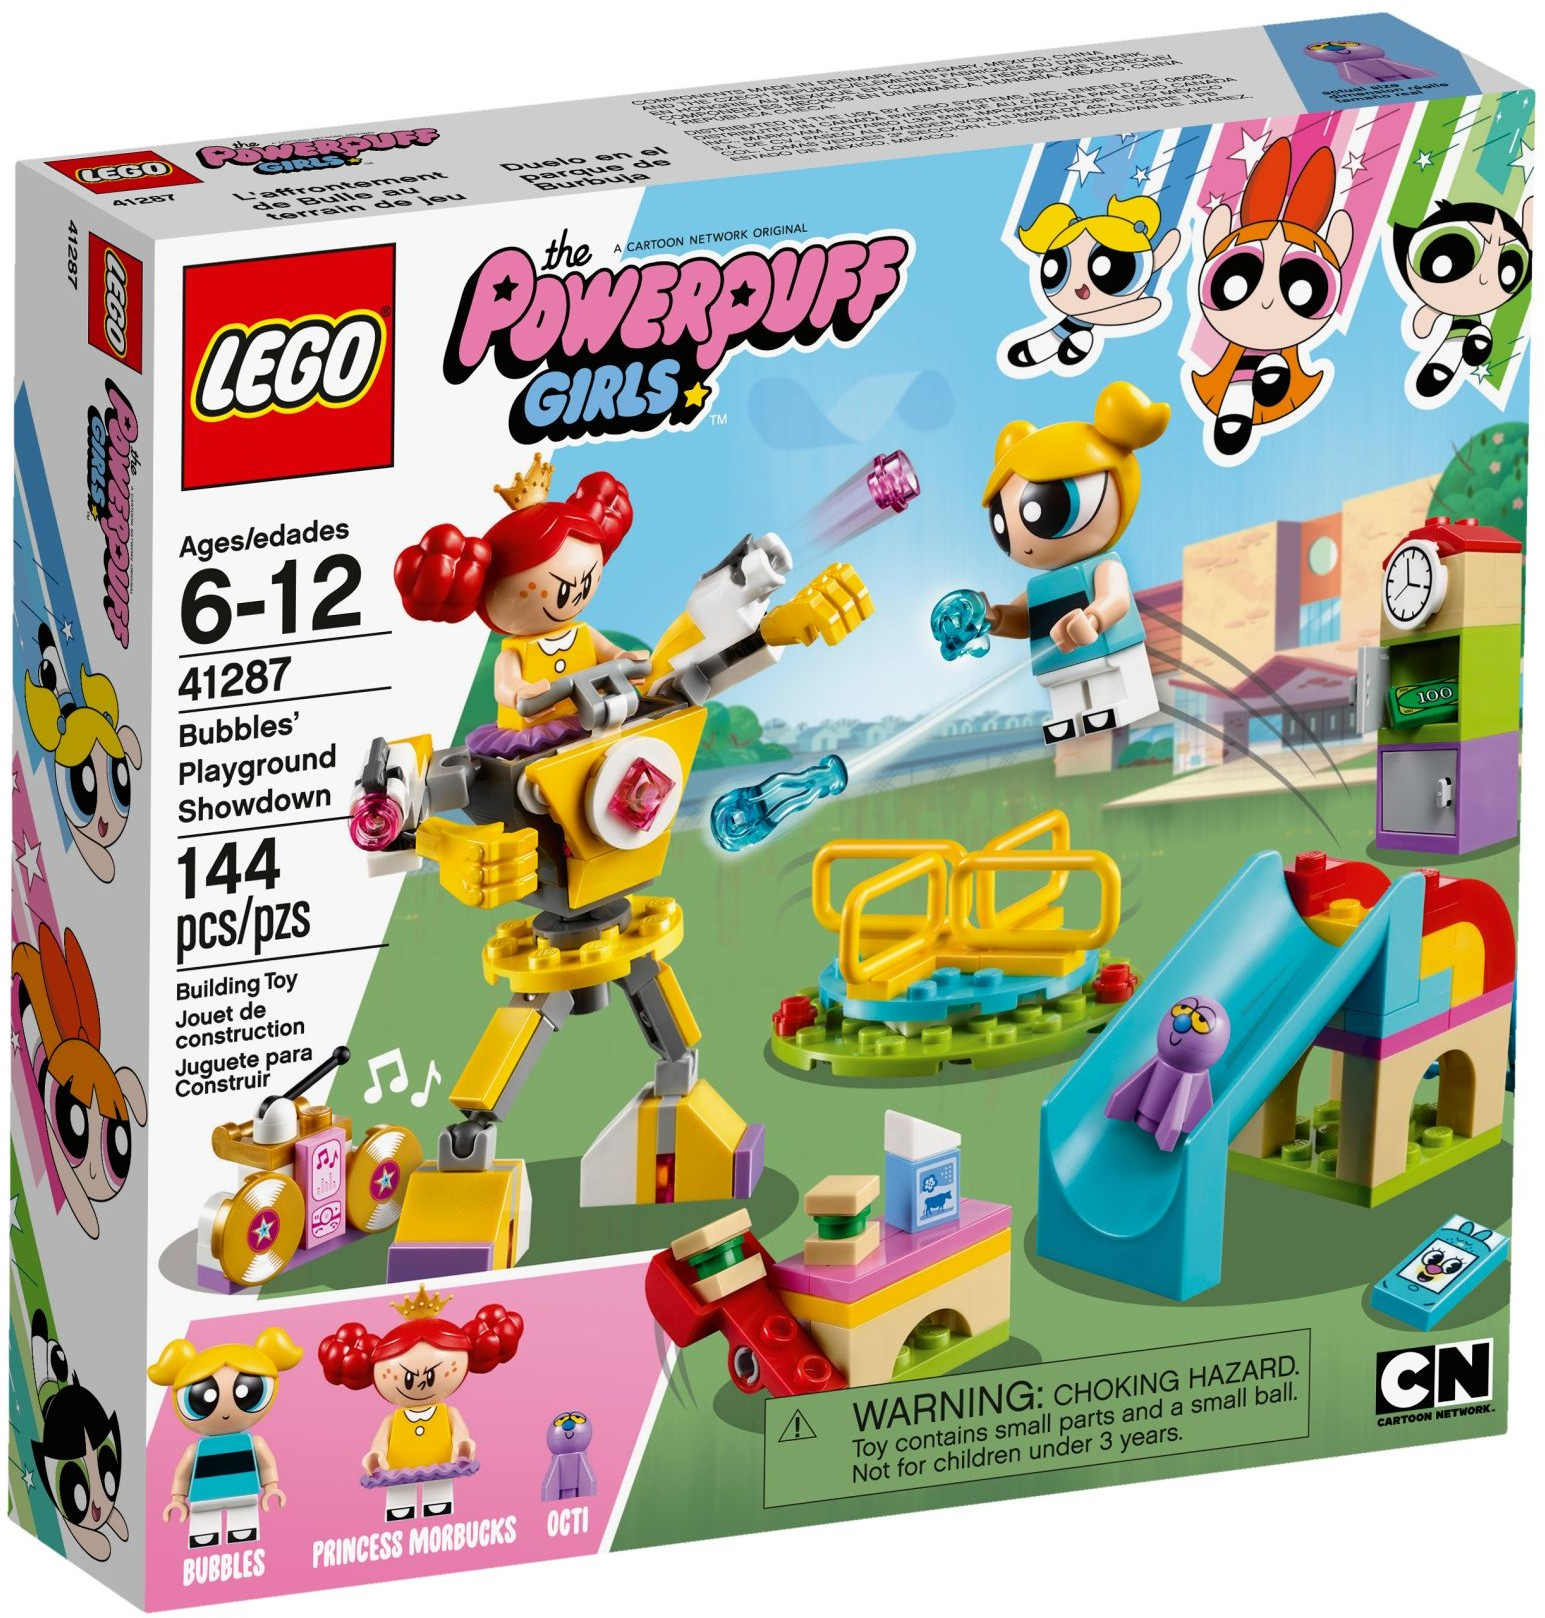 41287 Bubbles' Playground Showdown